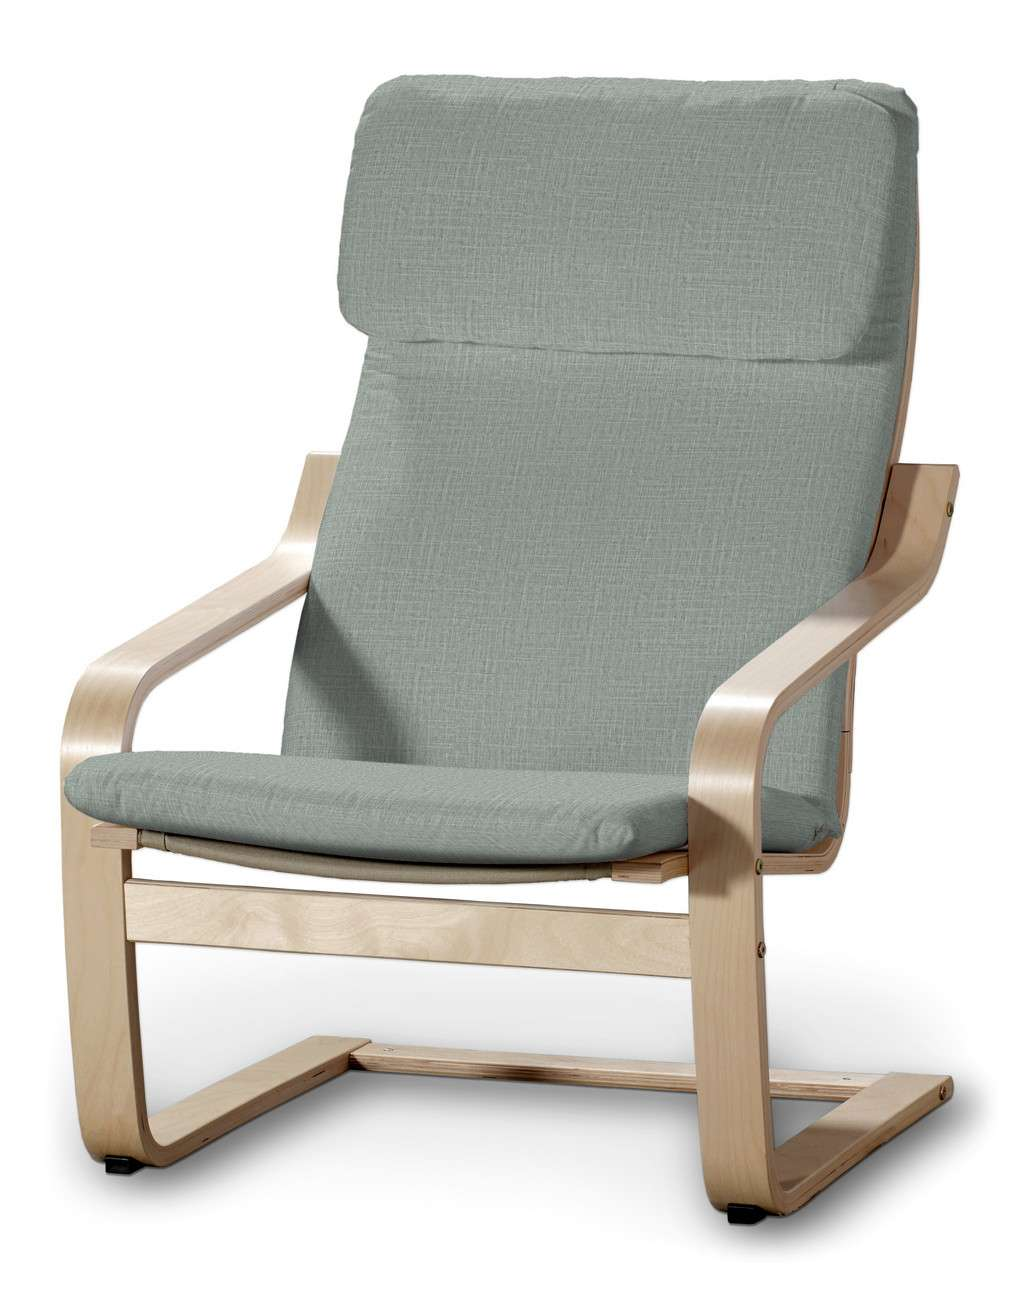 Poduszka na fotel Poäng w kolekcji Living, tkanina: 160-86